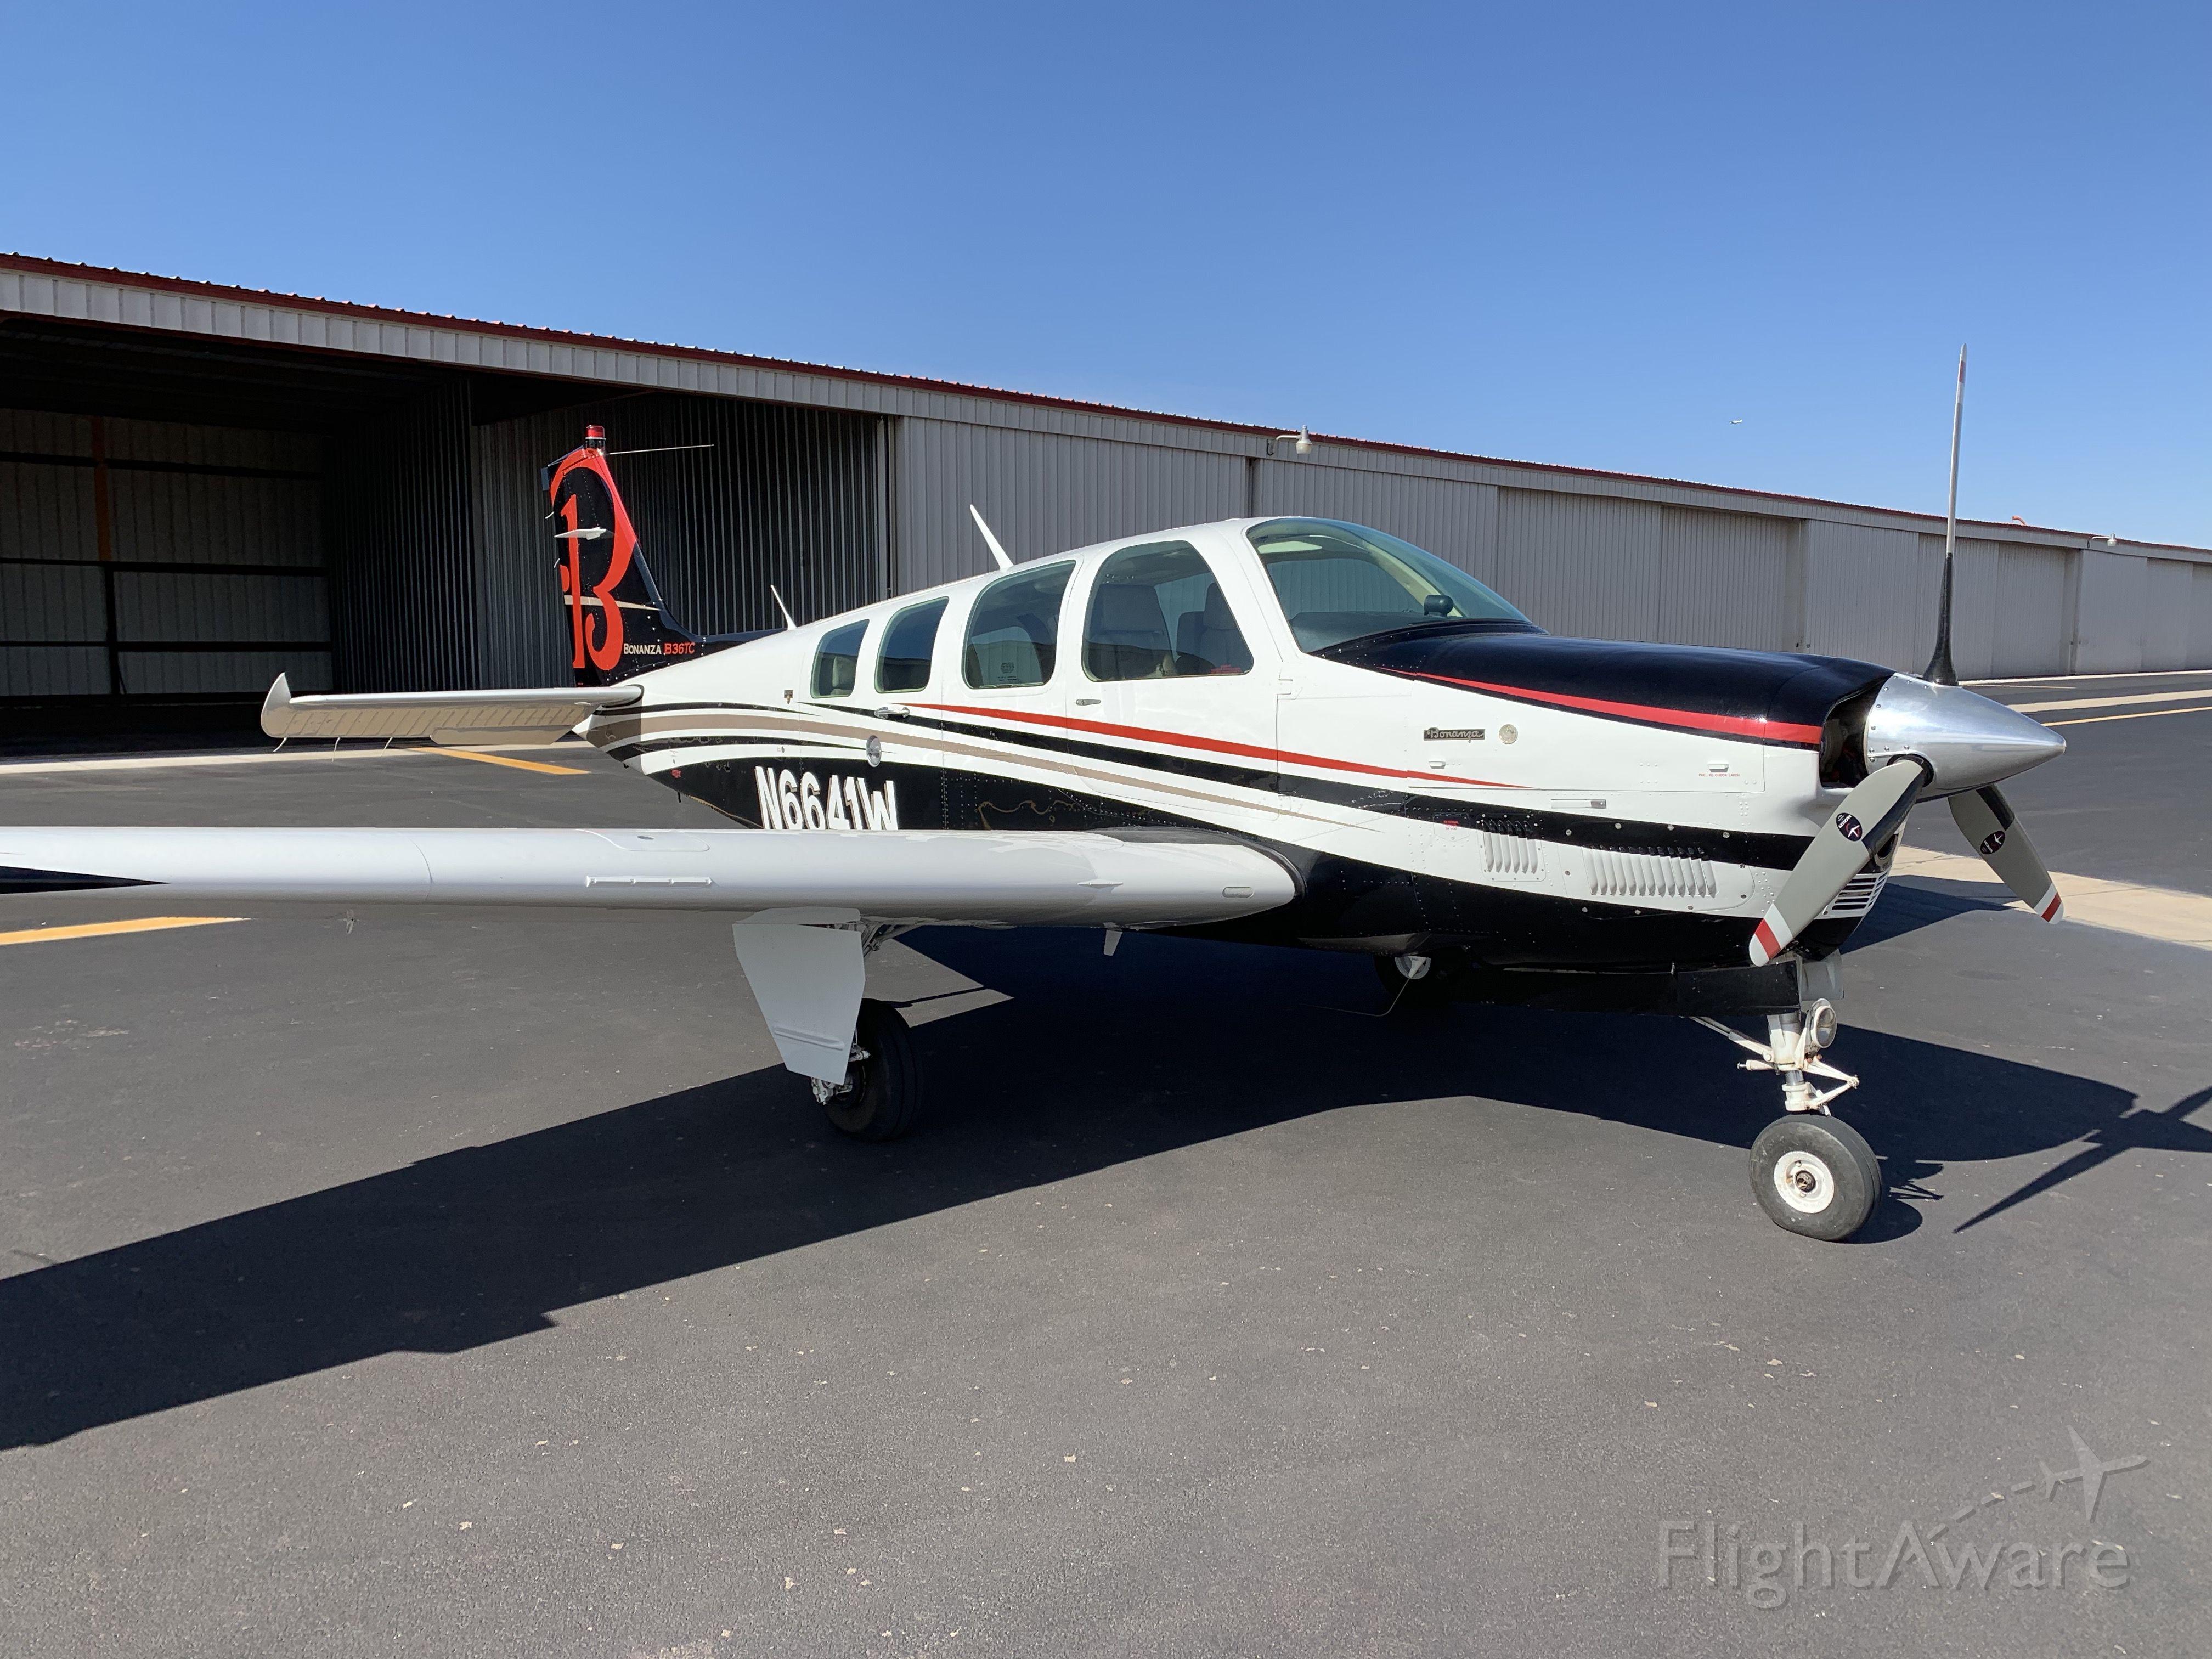 Beechcraft Bonanza (36) Turbo (N6641W)